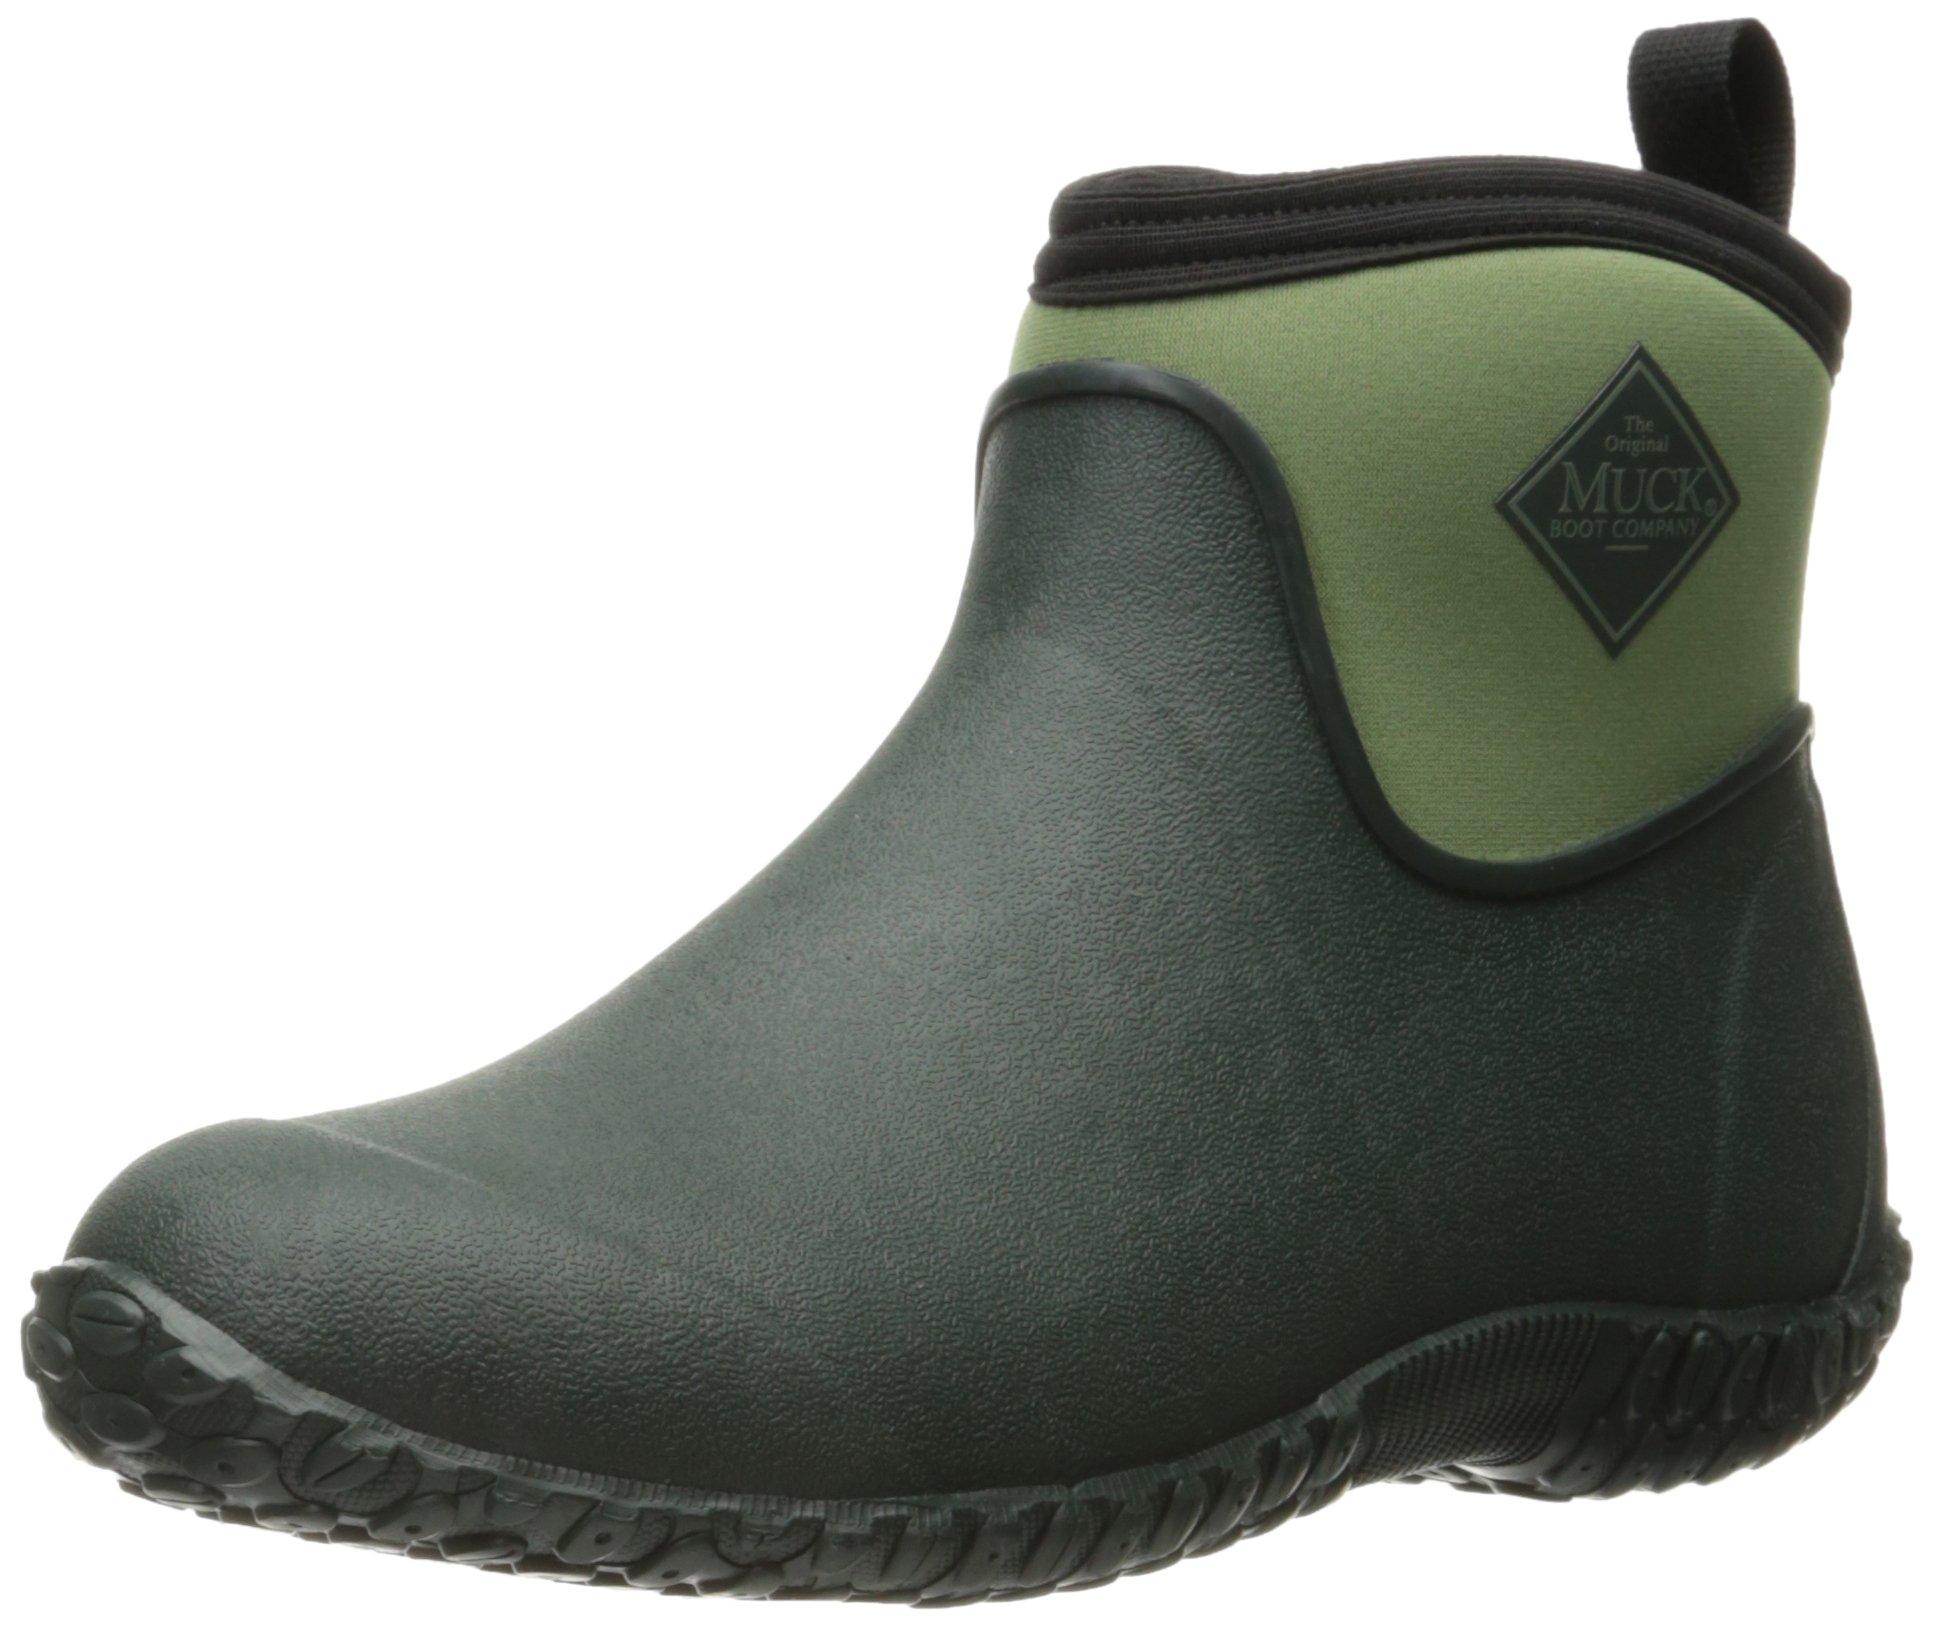 Muck Boot Women's Muckster 2 Ankle Snow Boot, Green, 8 M US